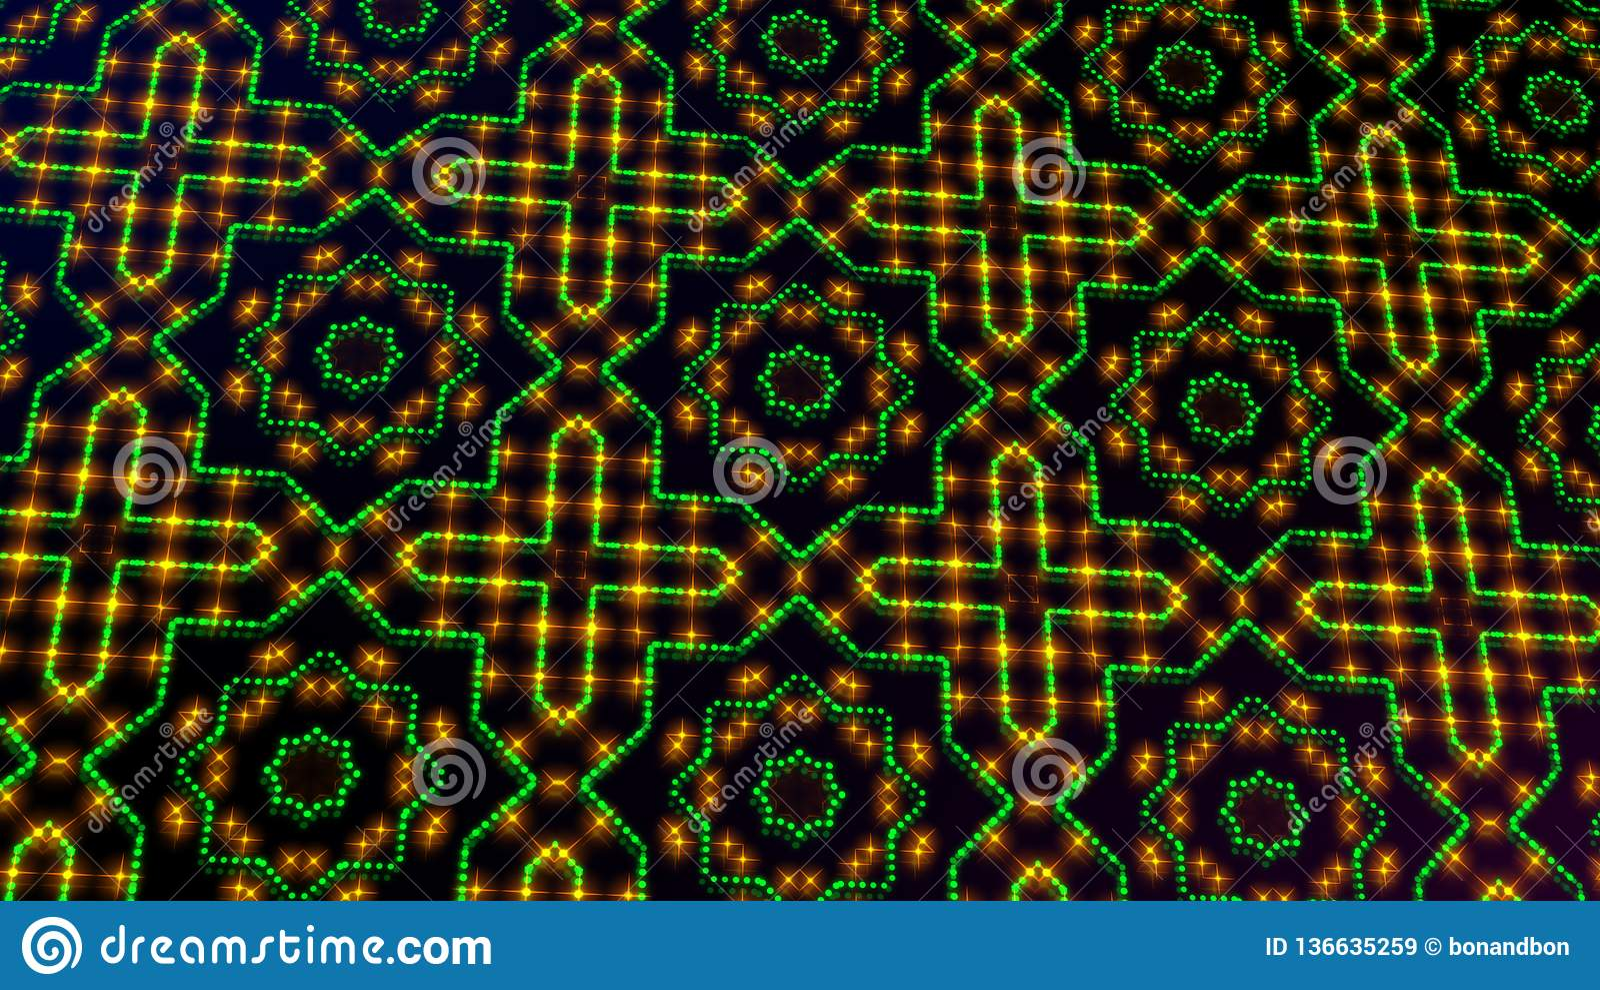 Geanimeerd licht die groene en gele punten en sterrenvormen shinning